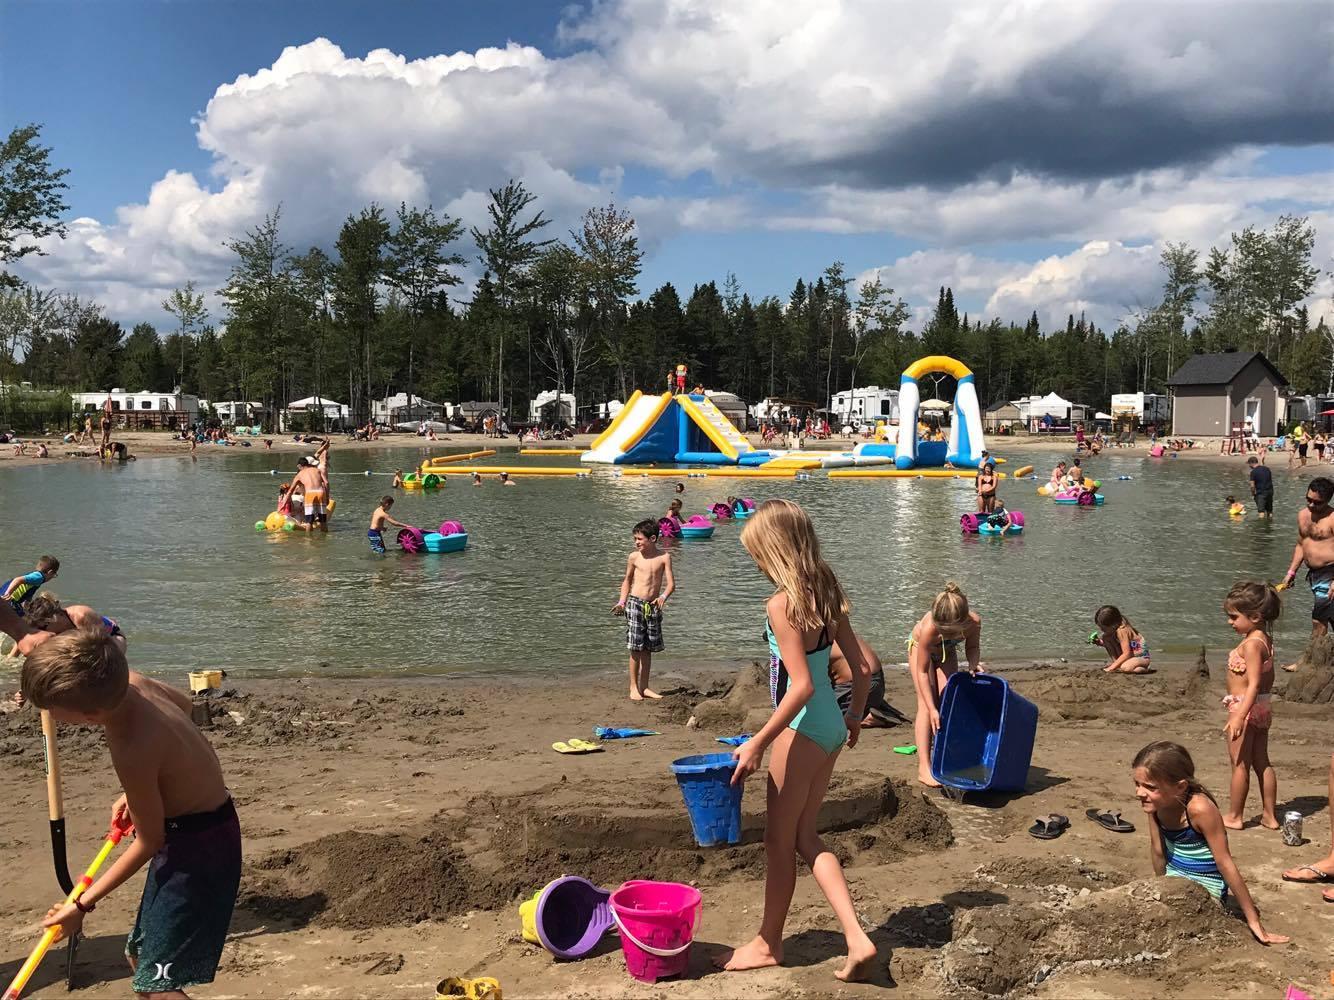 http://www.campingatlantide.com/wp-content/uploads/2018/01/beach-party-2017-complexe-atlantide-8.jpg